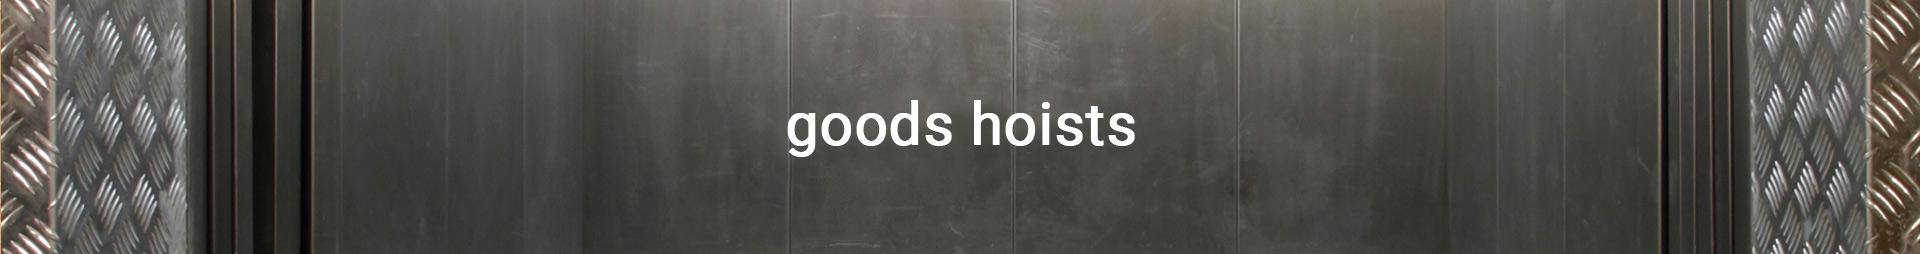 goods-hoists